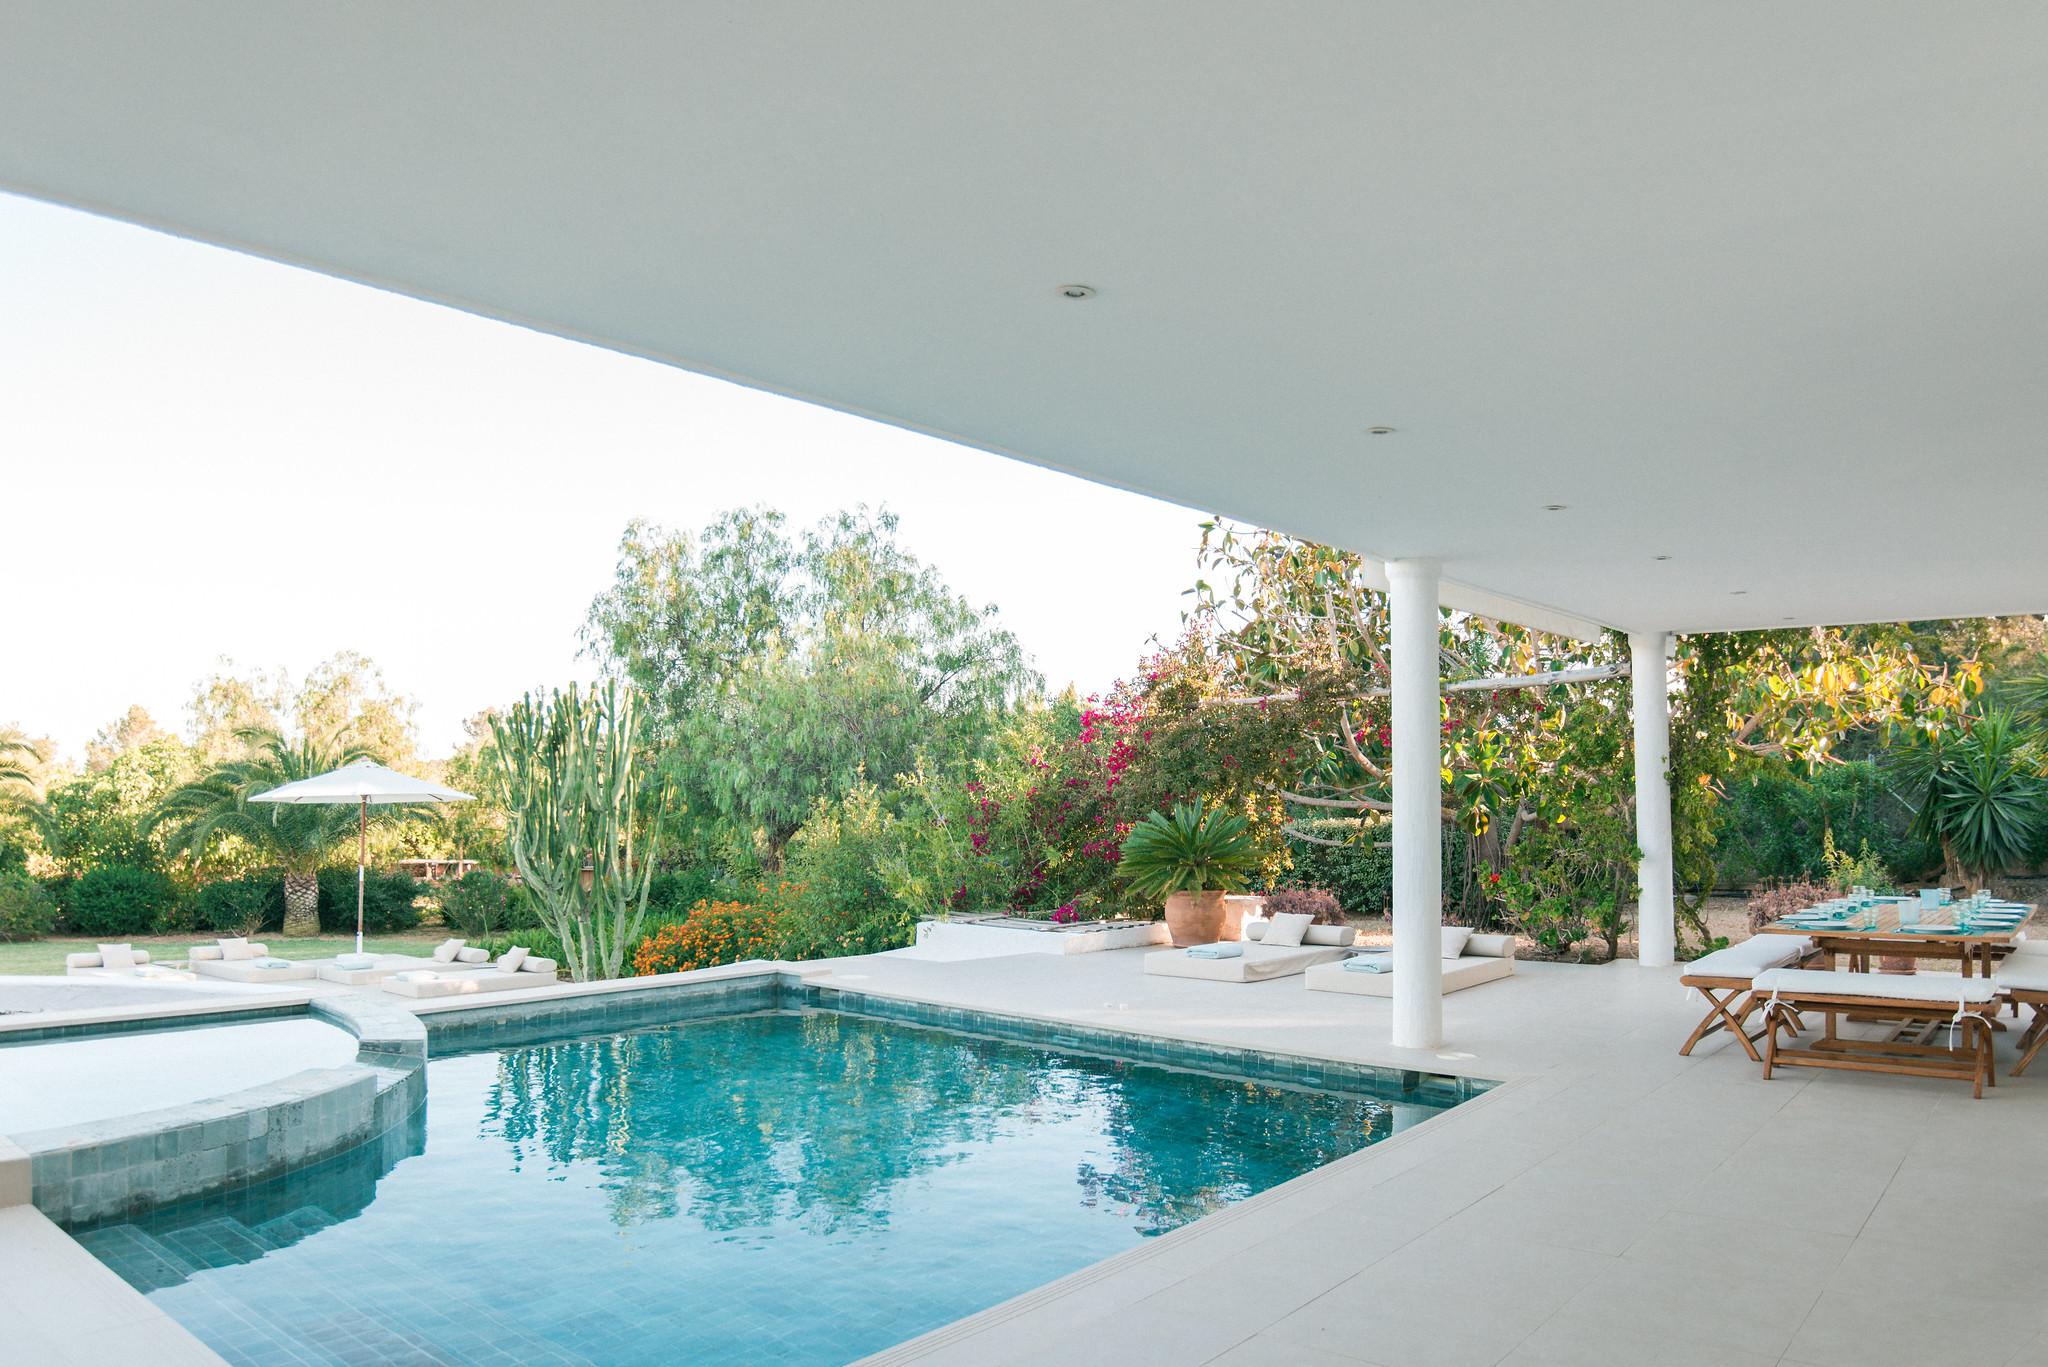 https://www.white-ibiza.com/wp-content/uploads/2020/06/white-ibiza-villas-casa-odette-exterior-pool-from-house.jpg